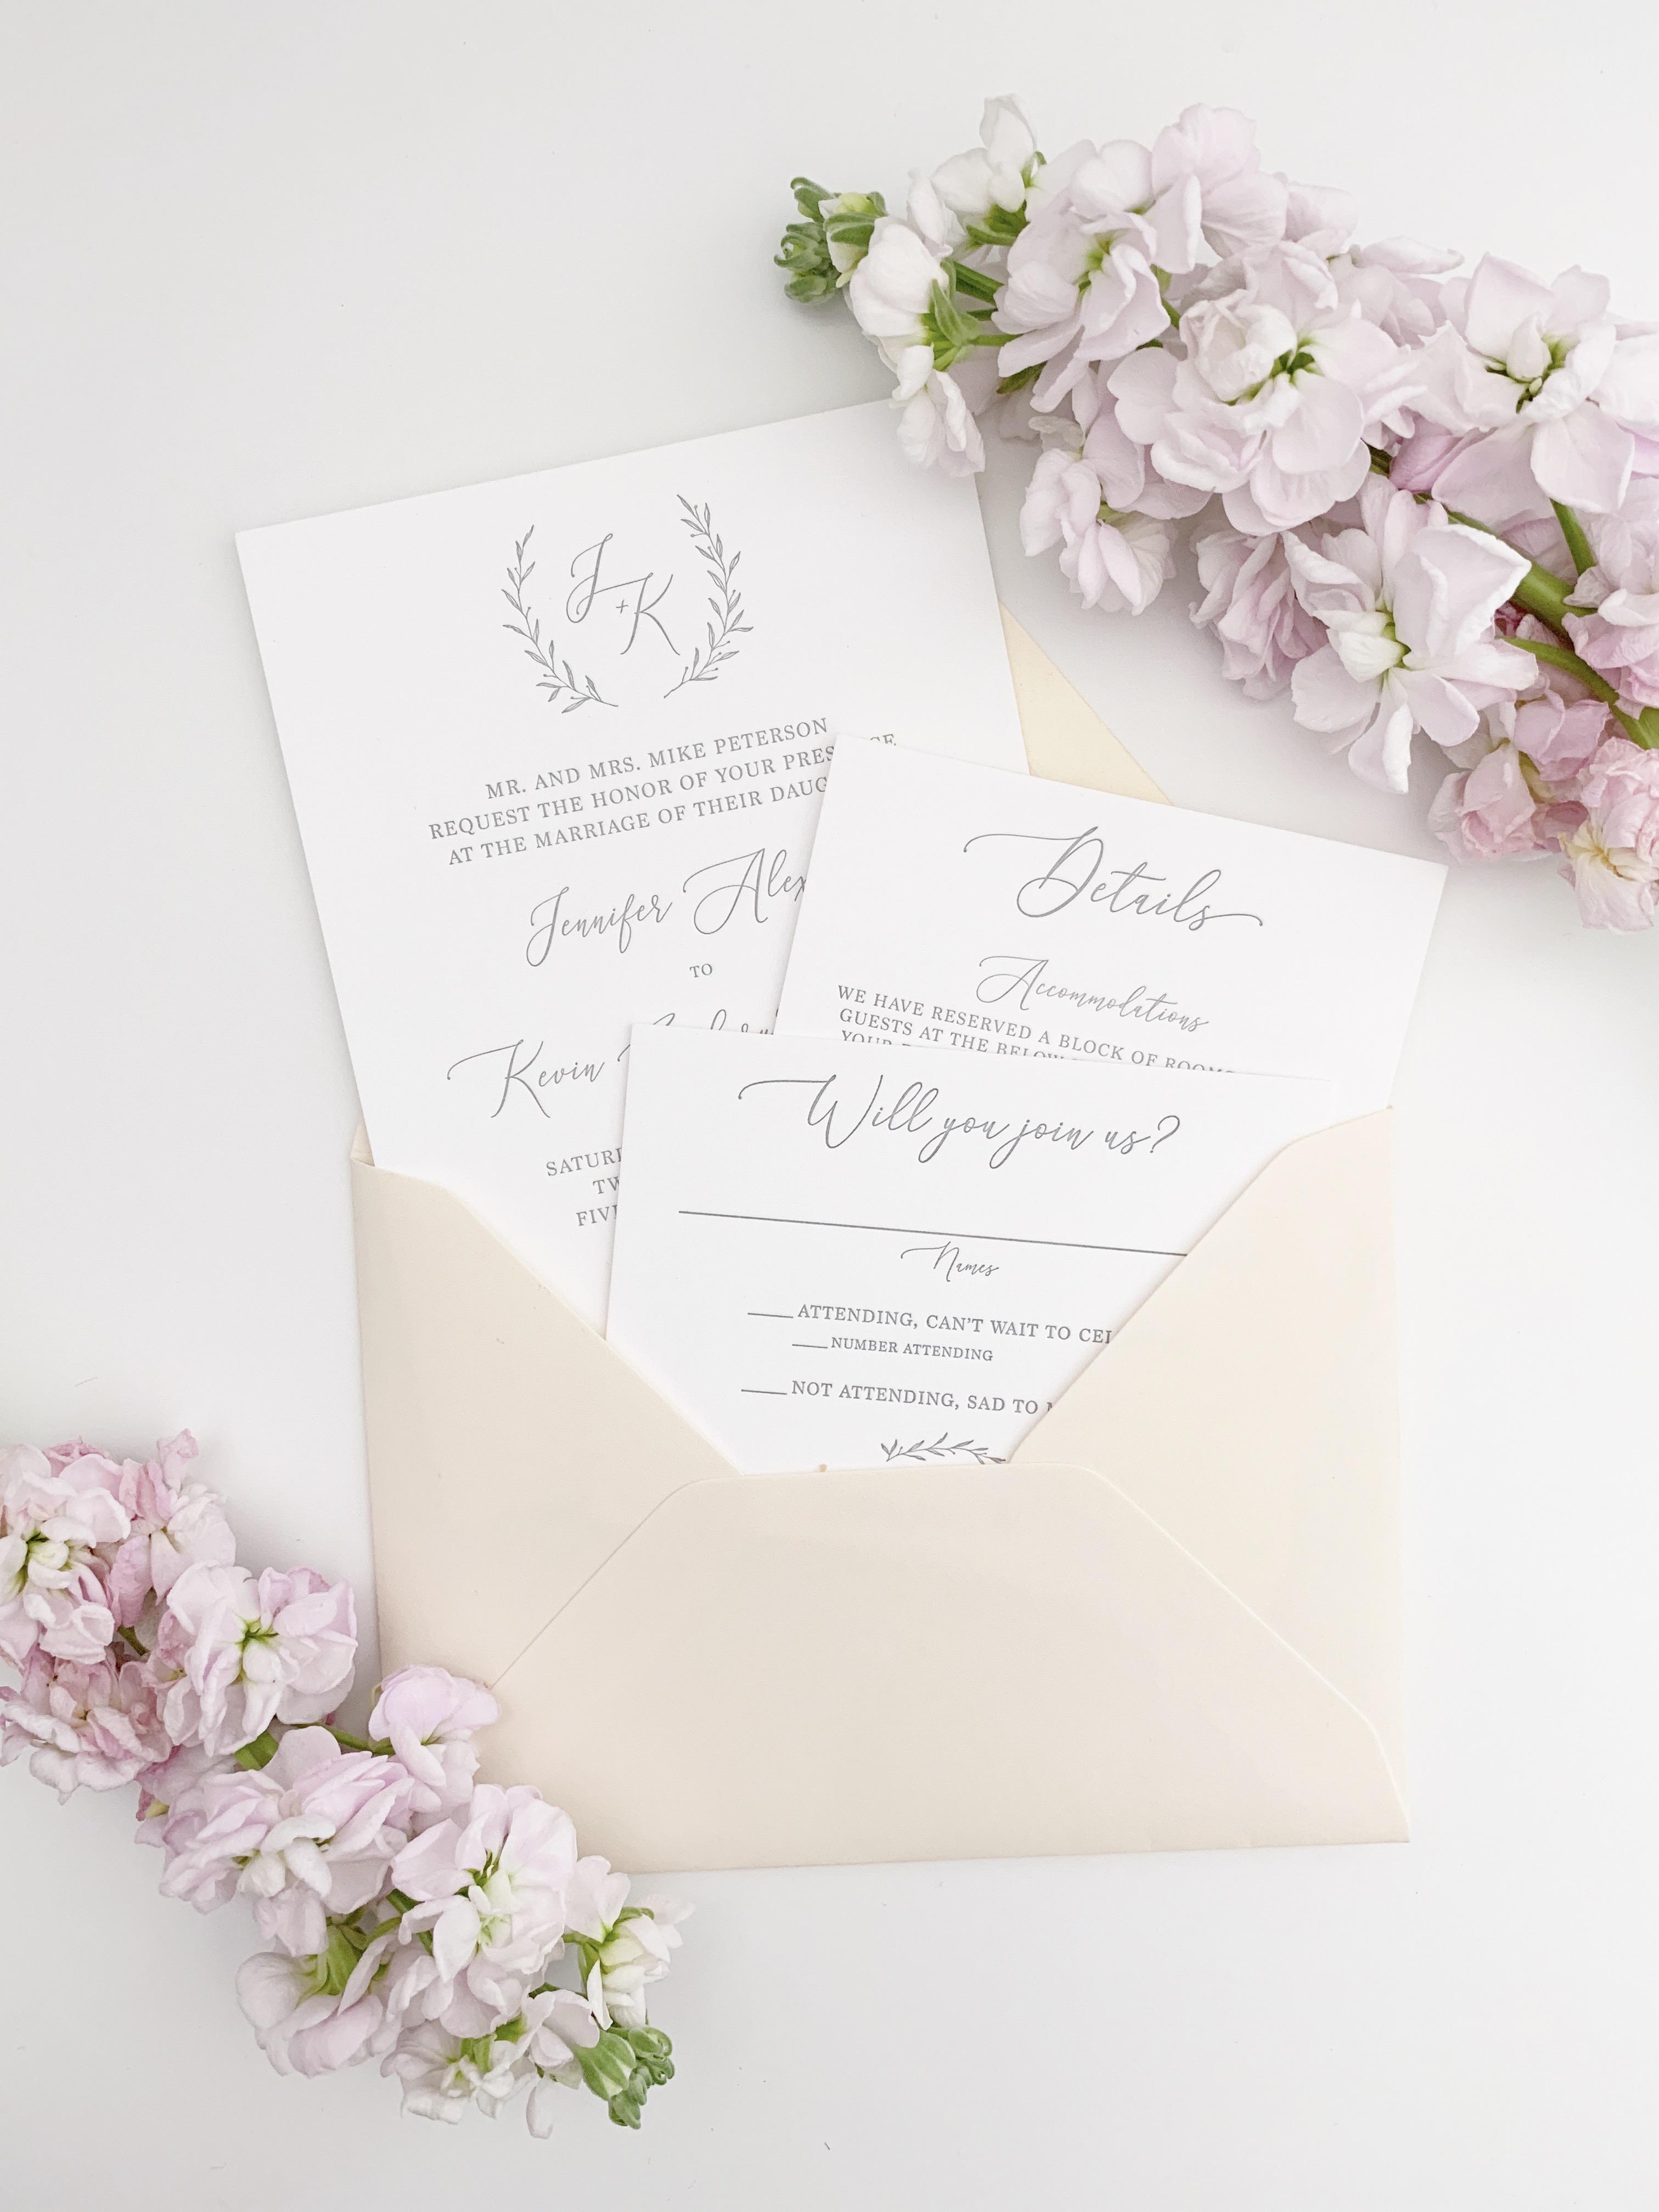 Letterpress Wedding Invitations.Simple Letterpress Wedding Invitation Sample